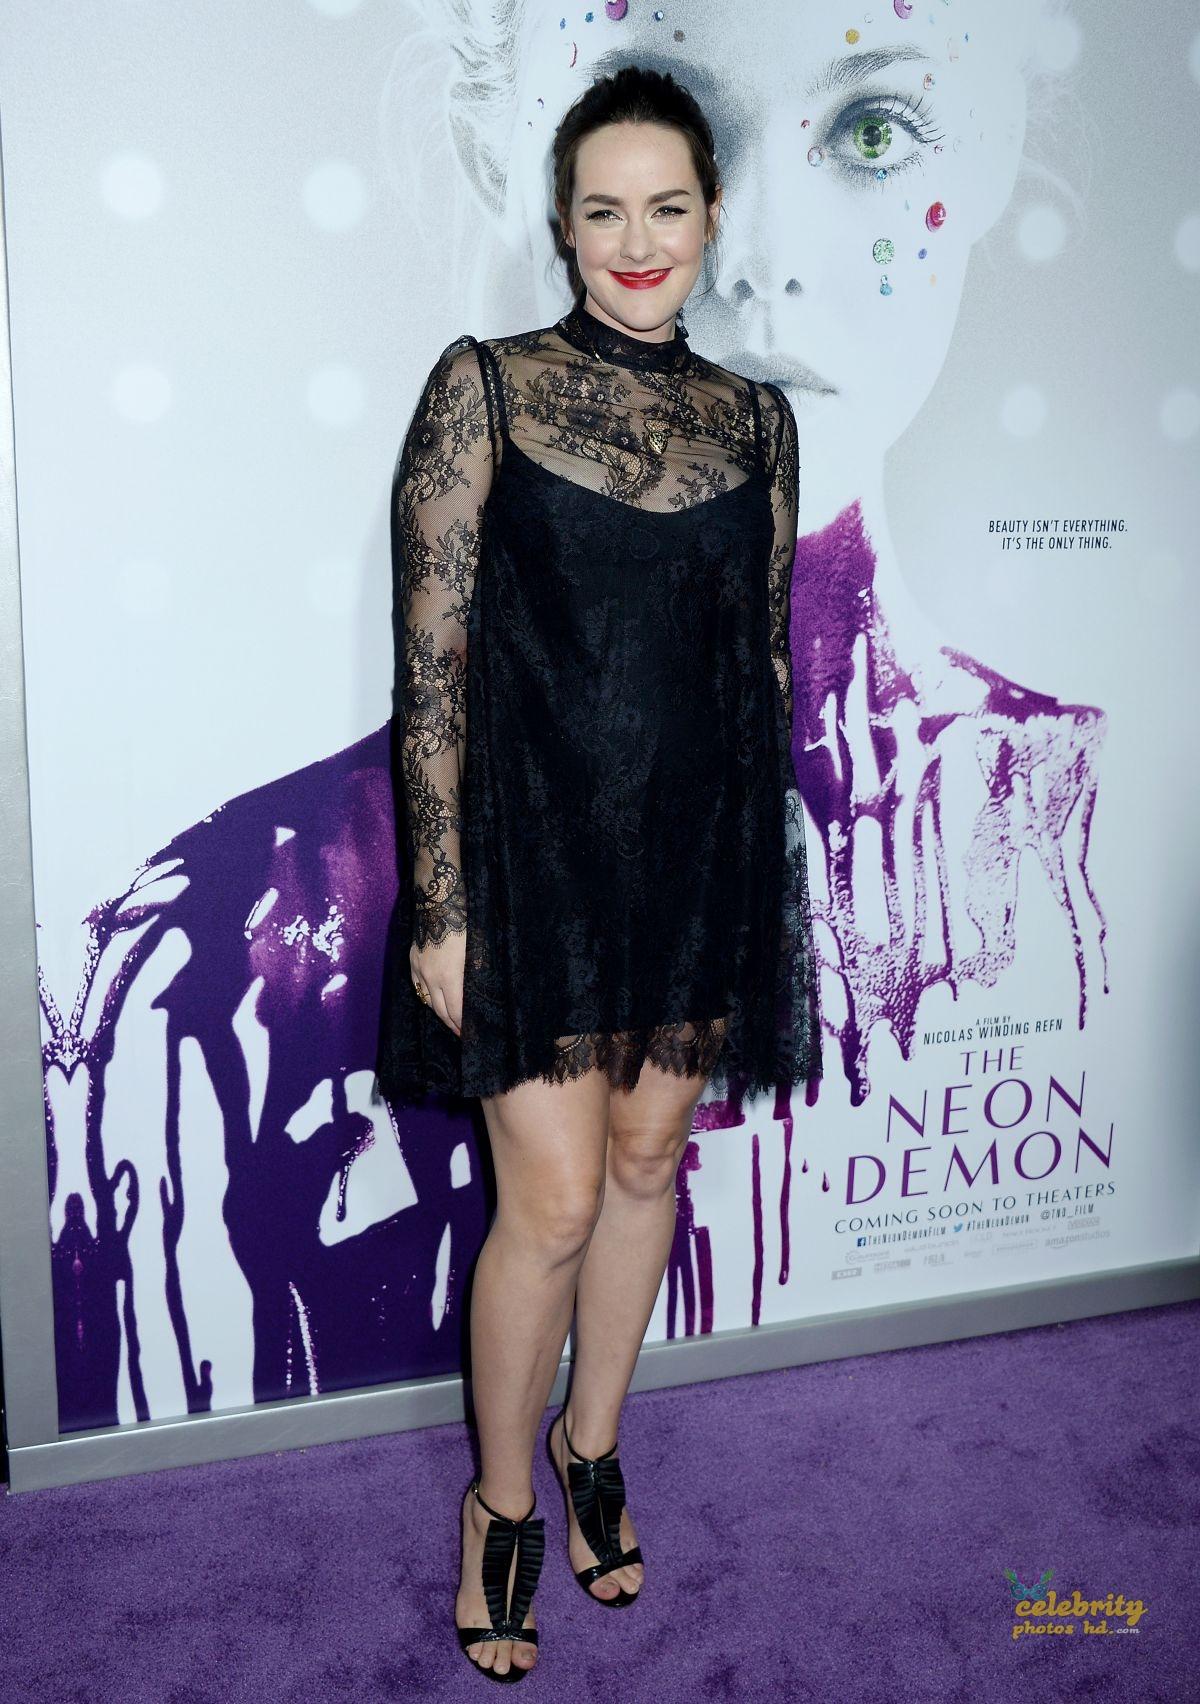 JENA MALONE at 'The Neon Demon' Premiere in Los Angeles (2)